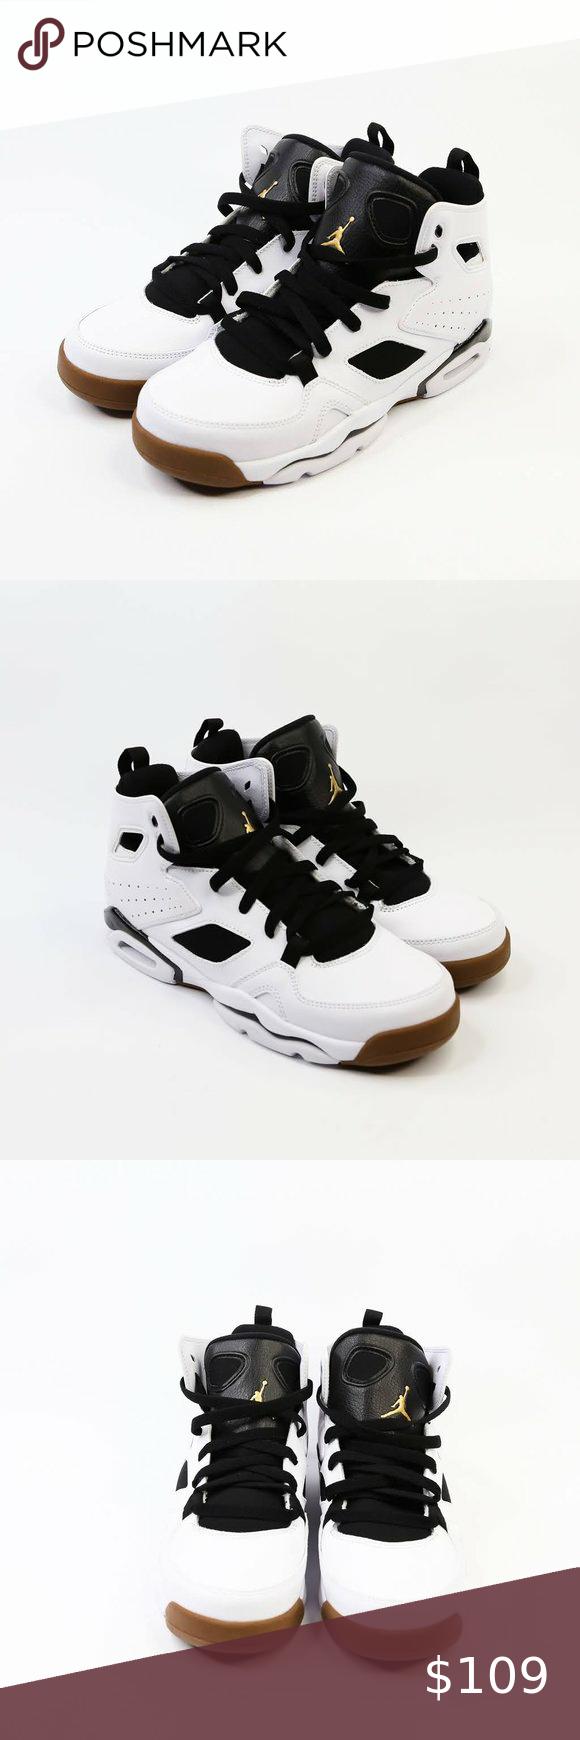 Nike Air Jordan Flight Club 92 GG in